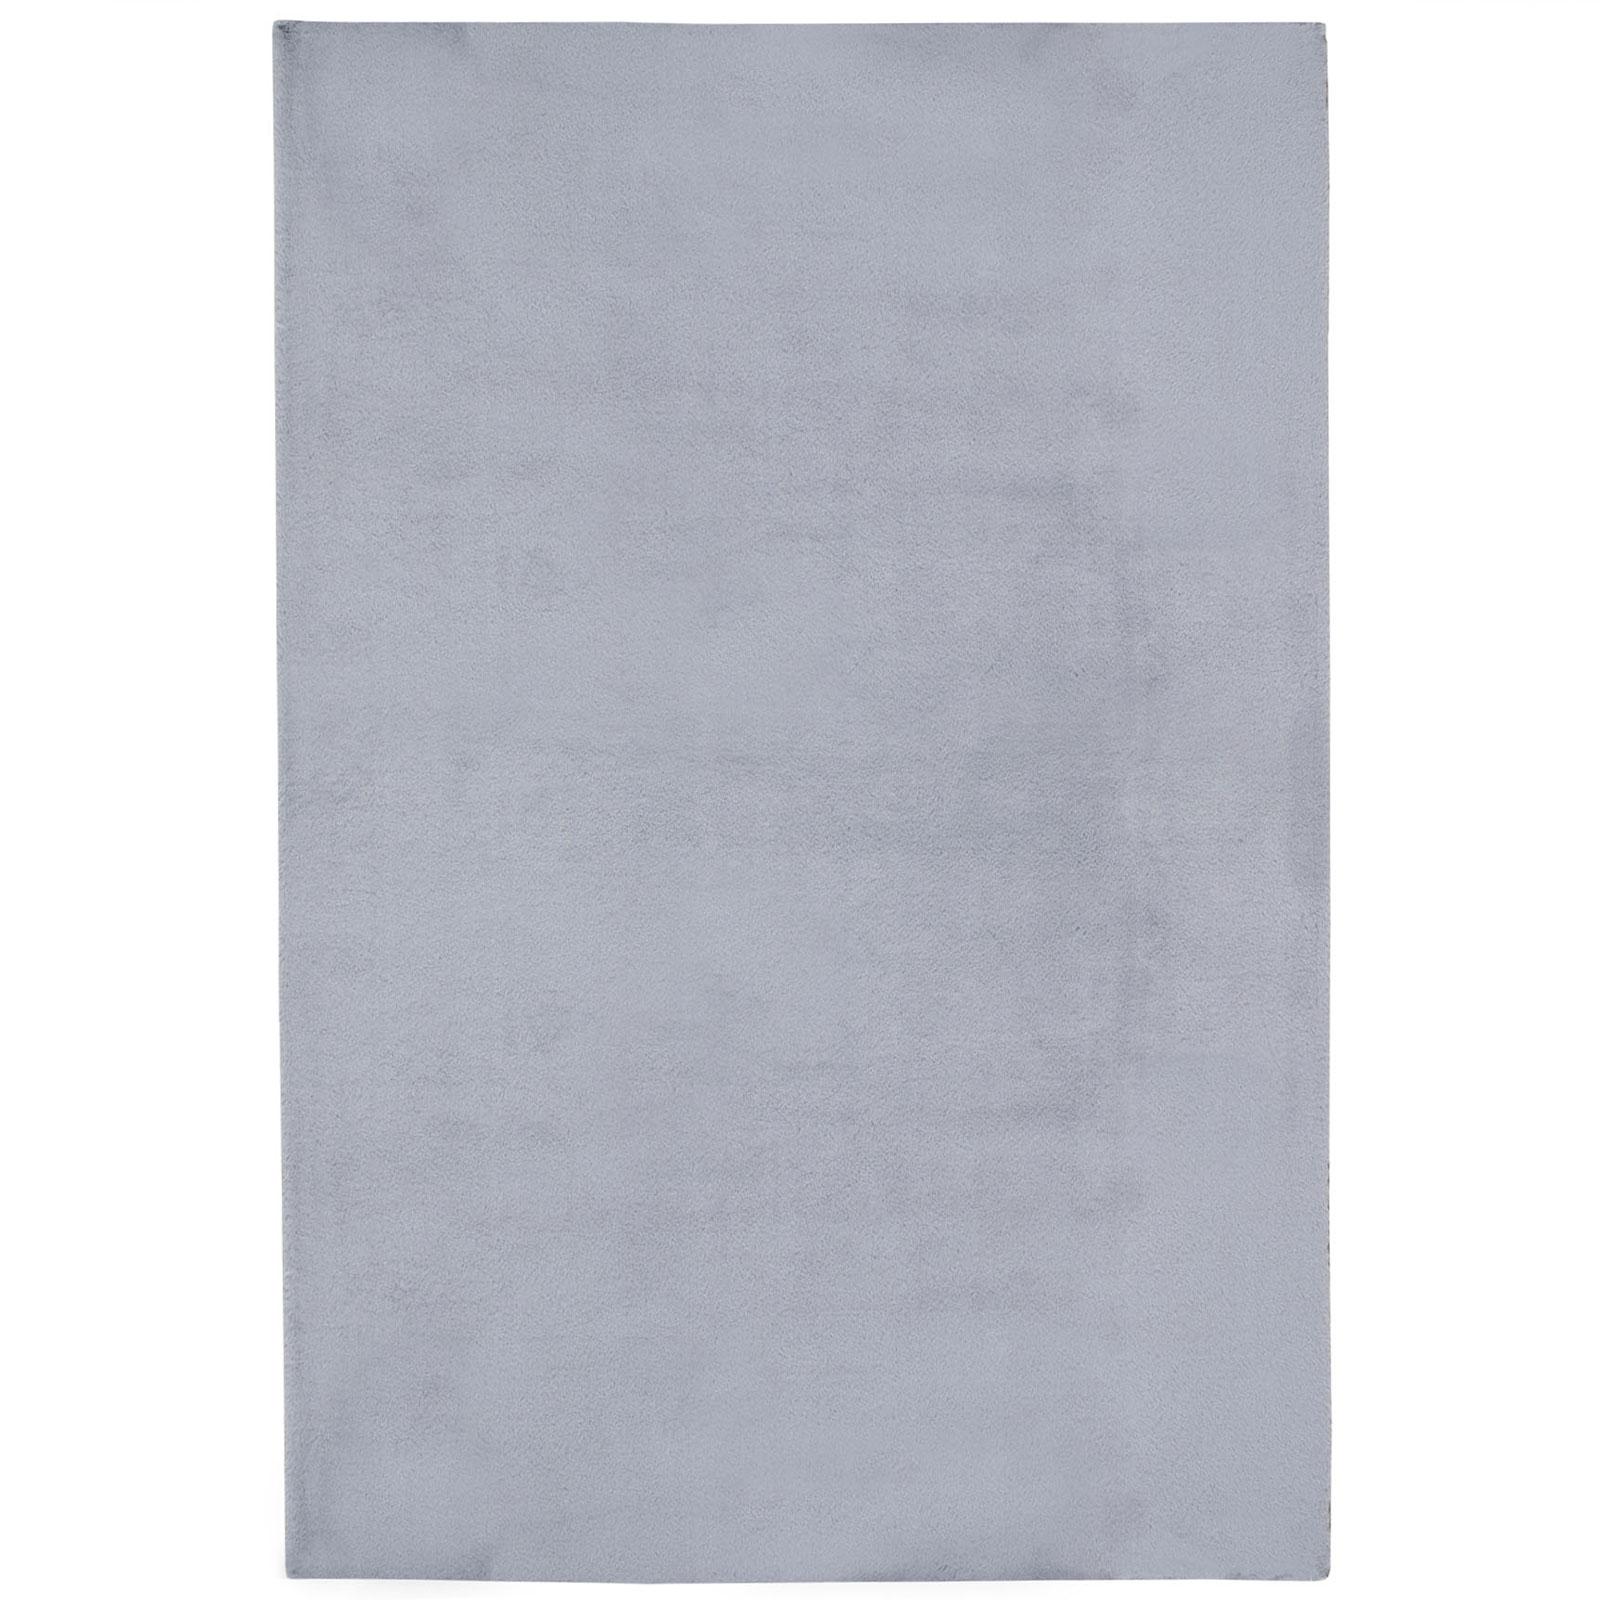 Comfy-Grey-Overhead-.jpg